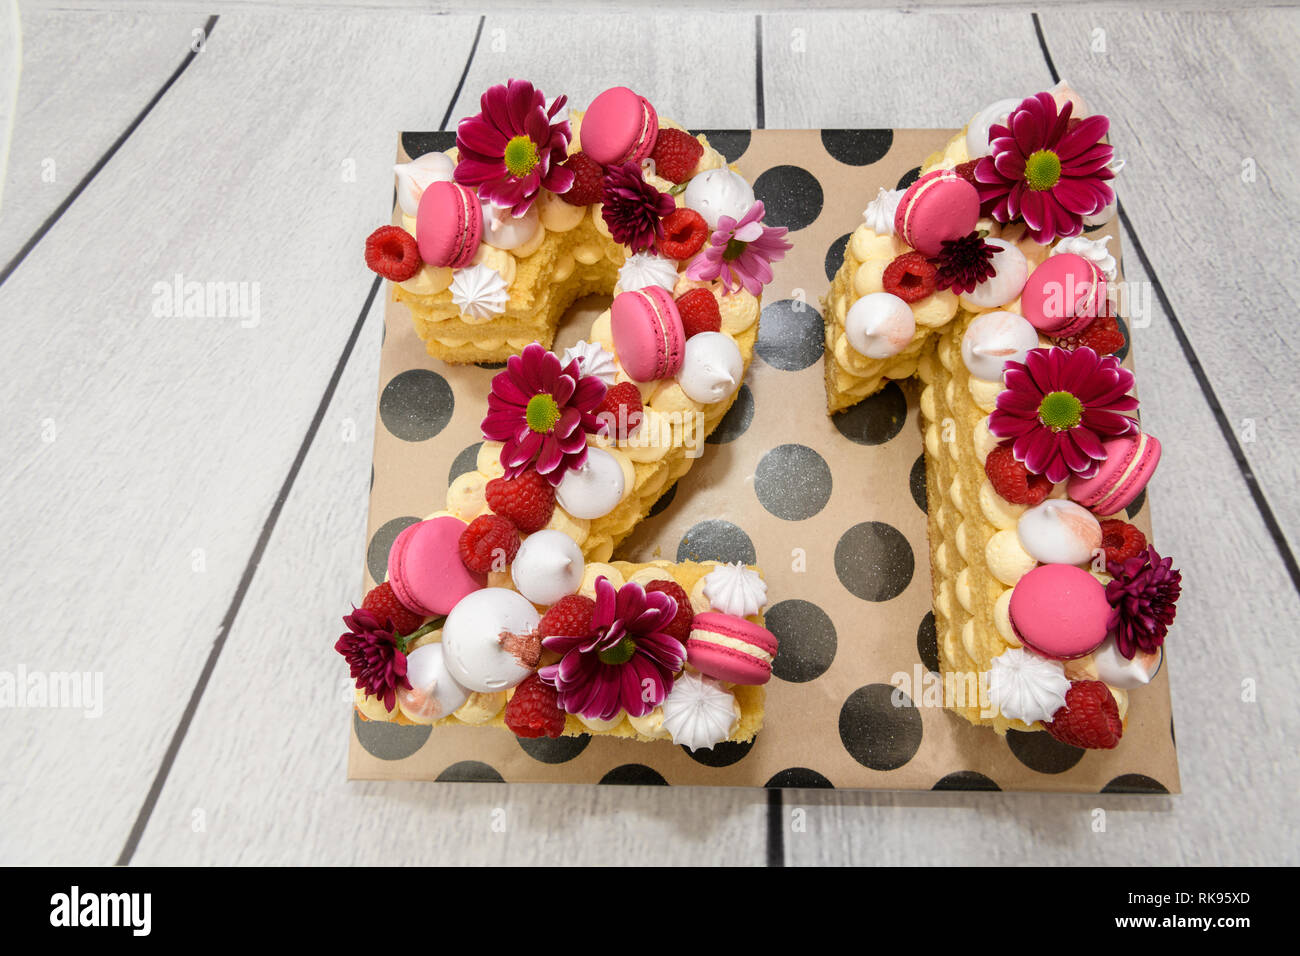 Stupendous Number 21 Novelty Birthday Cake Stock Photo 235615477 Alamy Personalised Birthday Cards Akebfashionlily Jamesorg